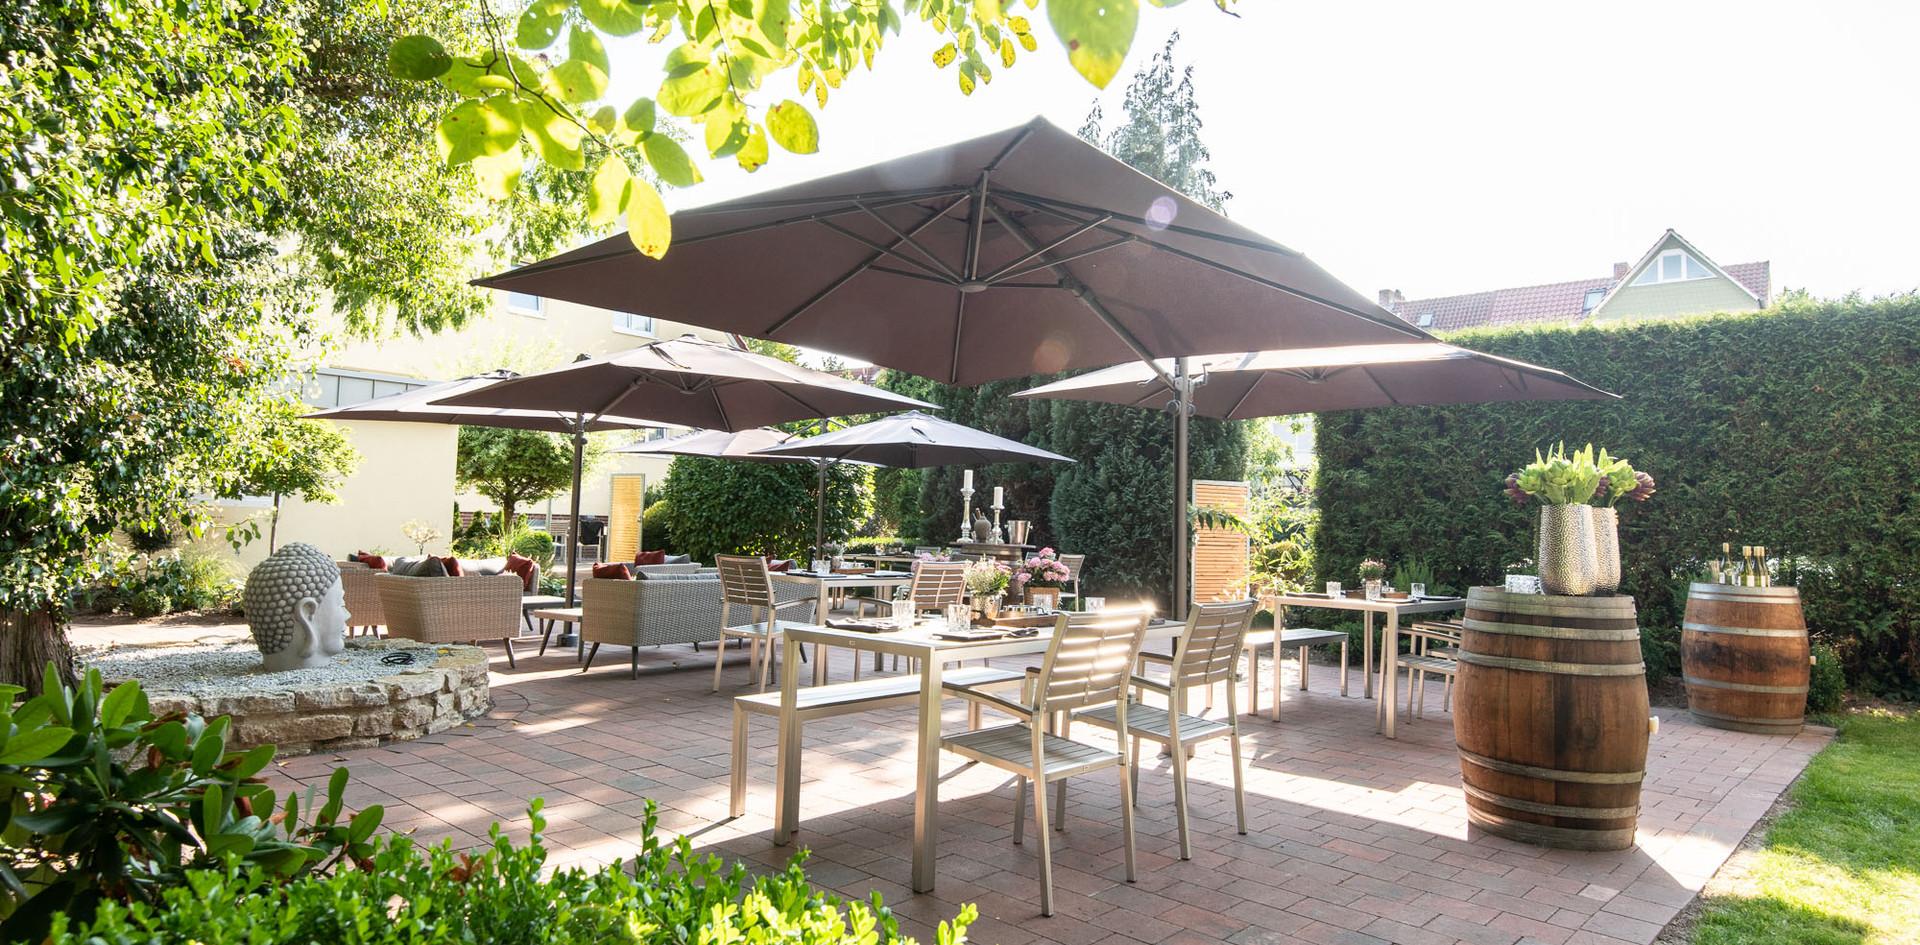 Gartenterrasse Hotel Wegner - the culinary art hotel